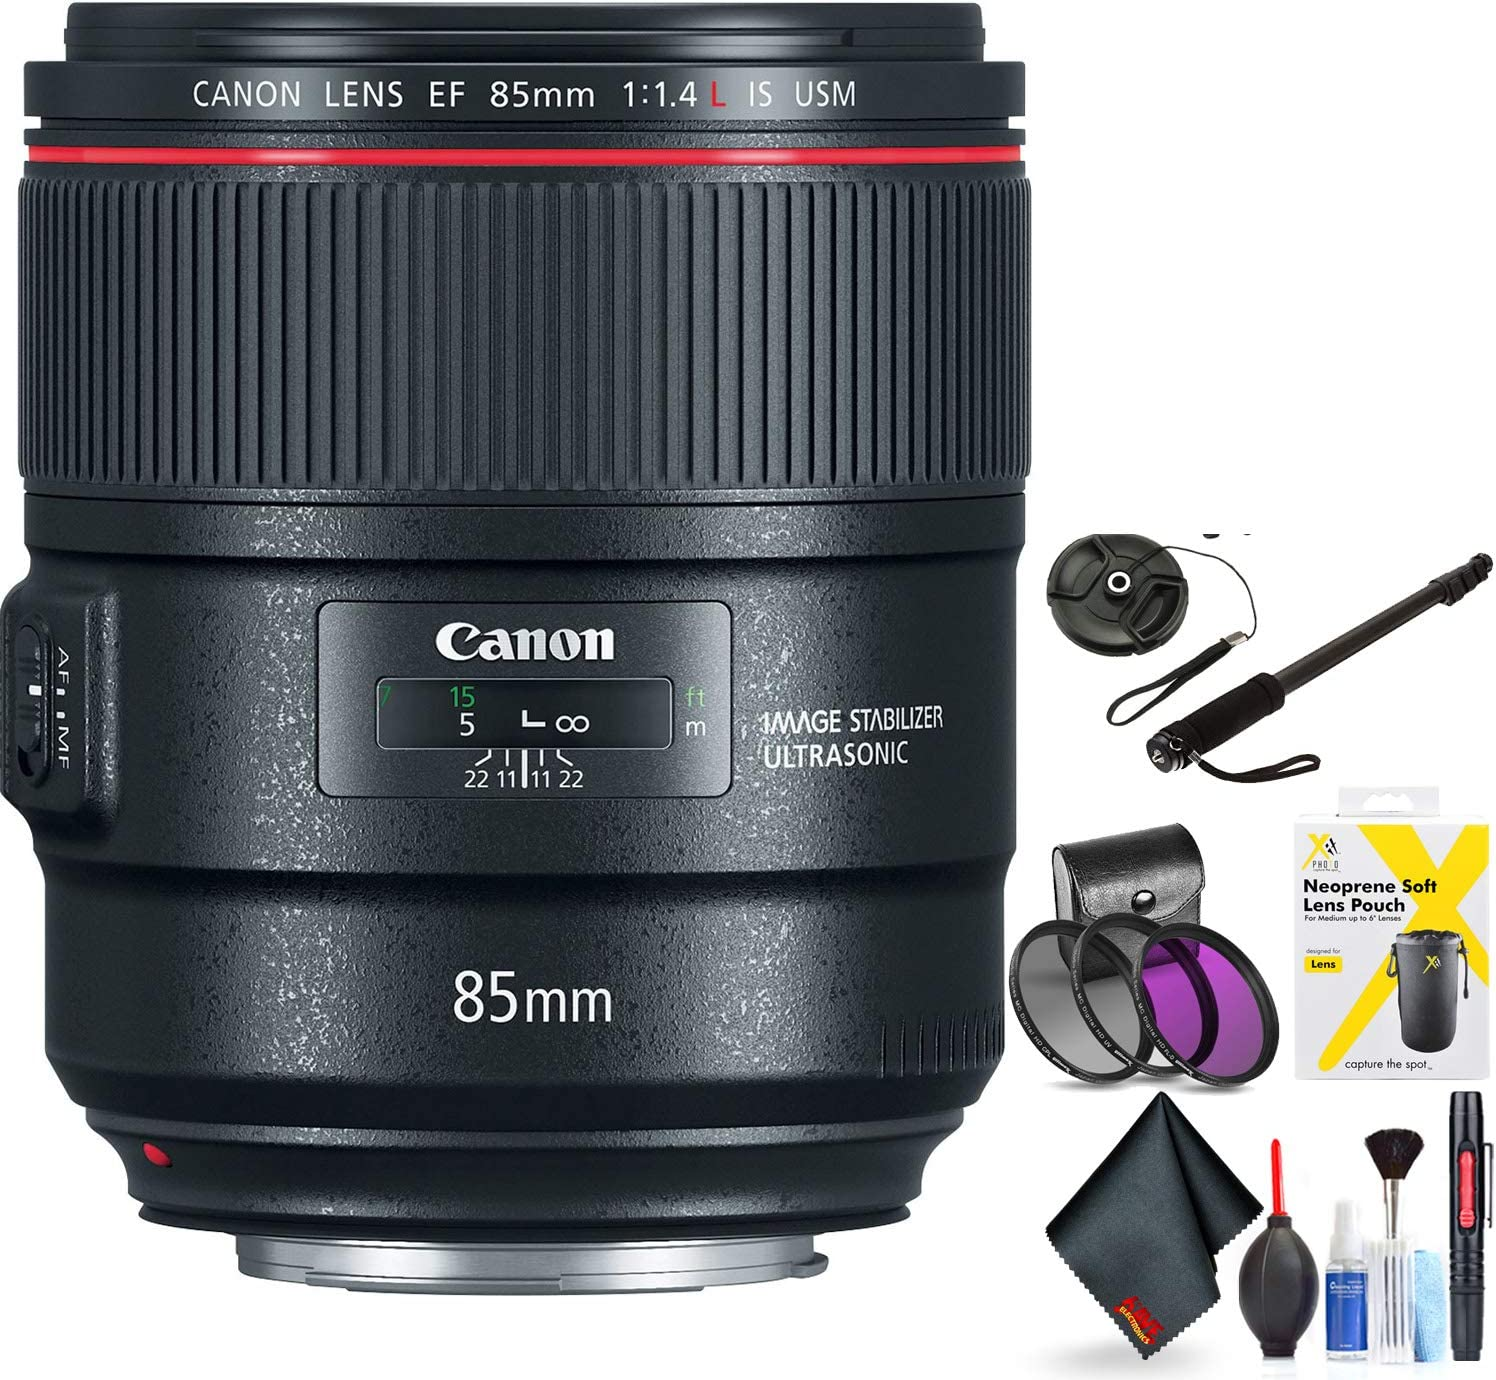 Canon EF 85mm F/1.4L is USM Lens for Canon 6D, 5D Mark IV, 5D Mark III, 5D Mark II, 6D Mark II, 5Dsr, 5Ds, 1Dx, 1Dx Mark II + Accessories (International Model)